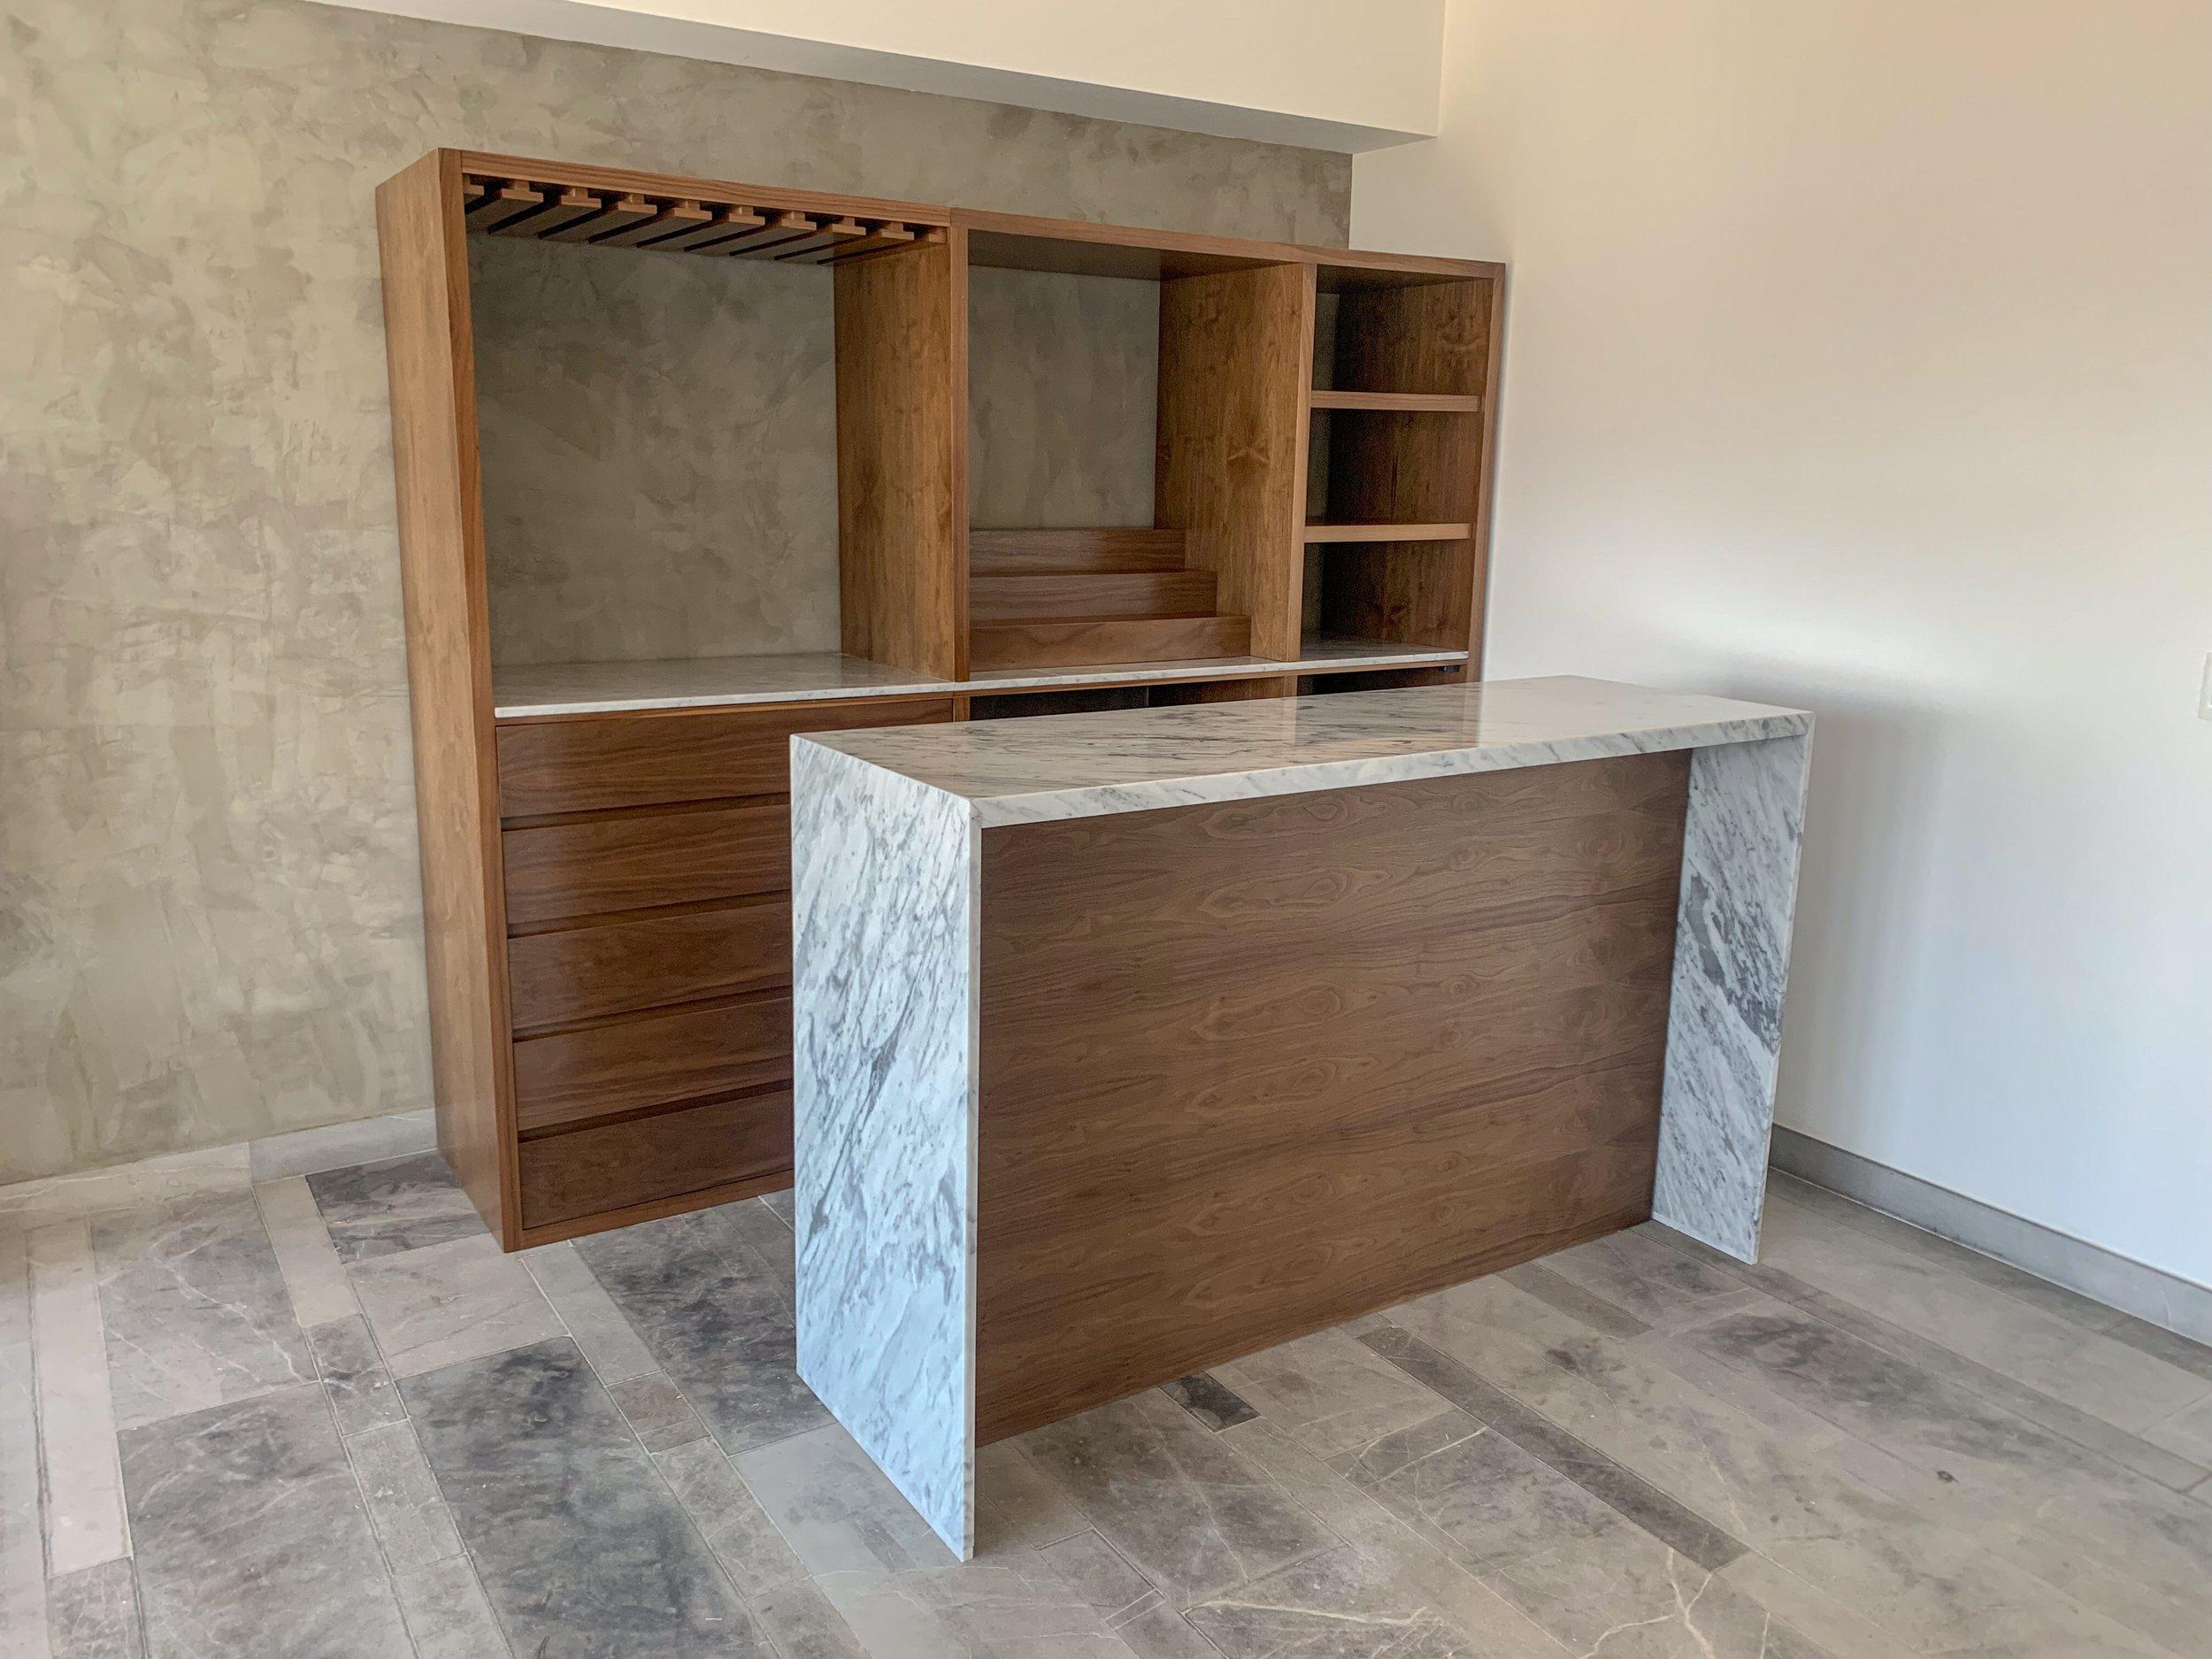 Barra-bar-interiores-diseñodeinteriores-blum-alba